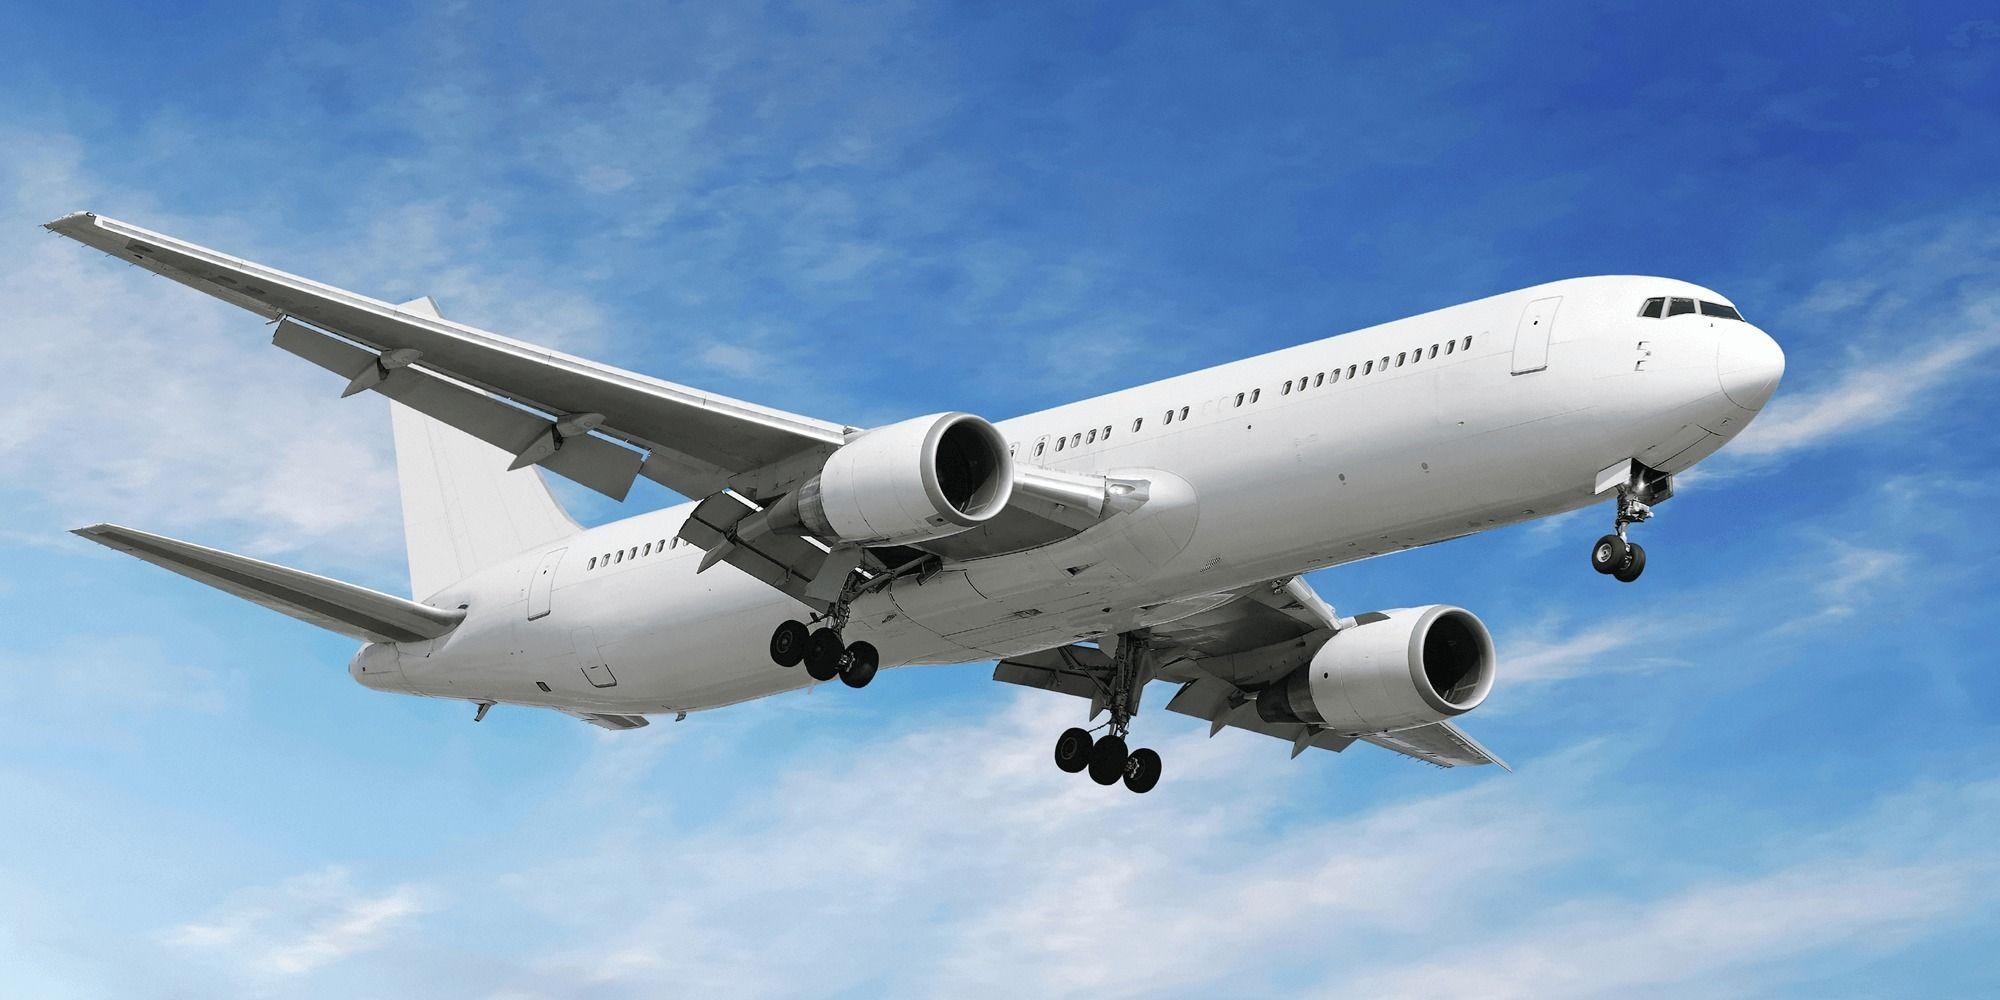 Boeing Business Jet Cancelled flight, Airline flights